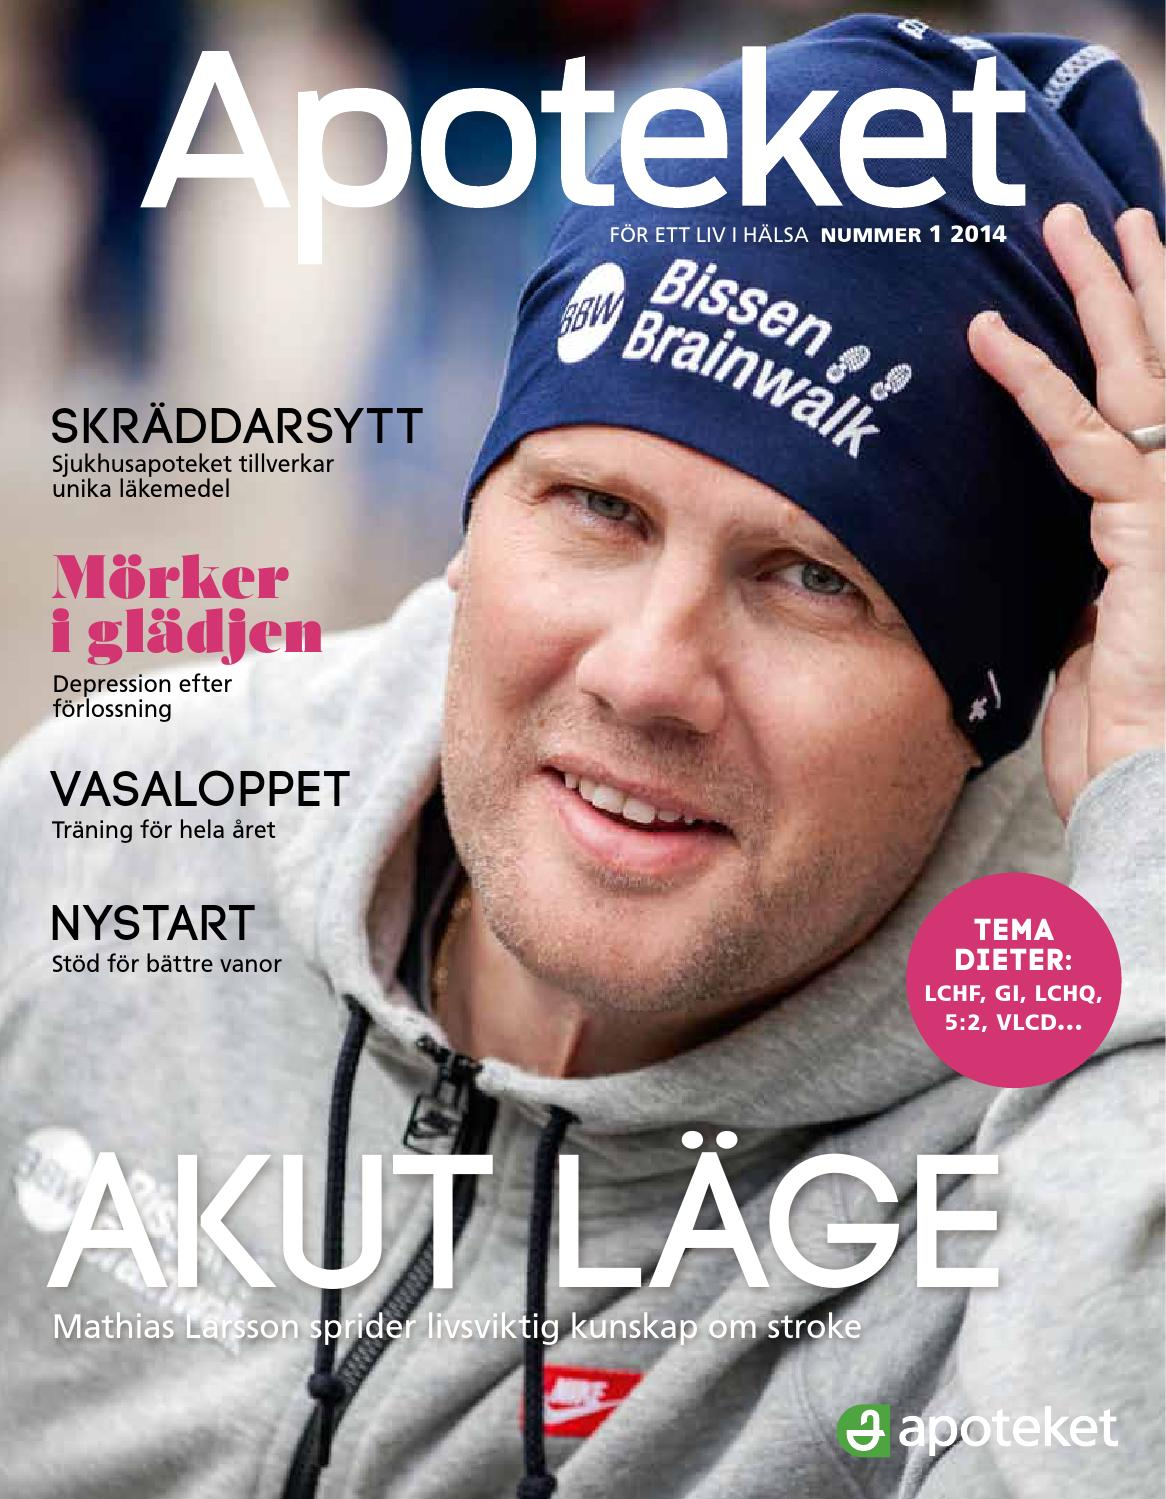 Tidningen Apoteket 1 2014 by Apoteket AB - issuu